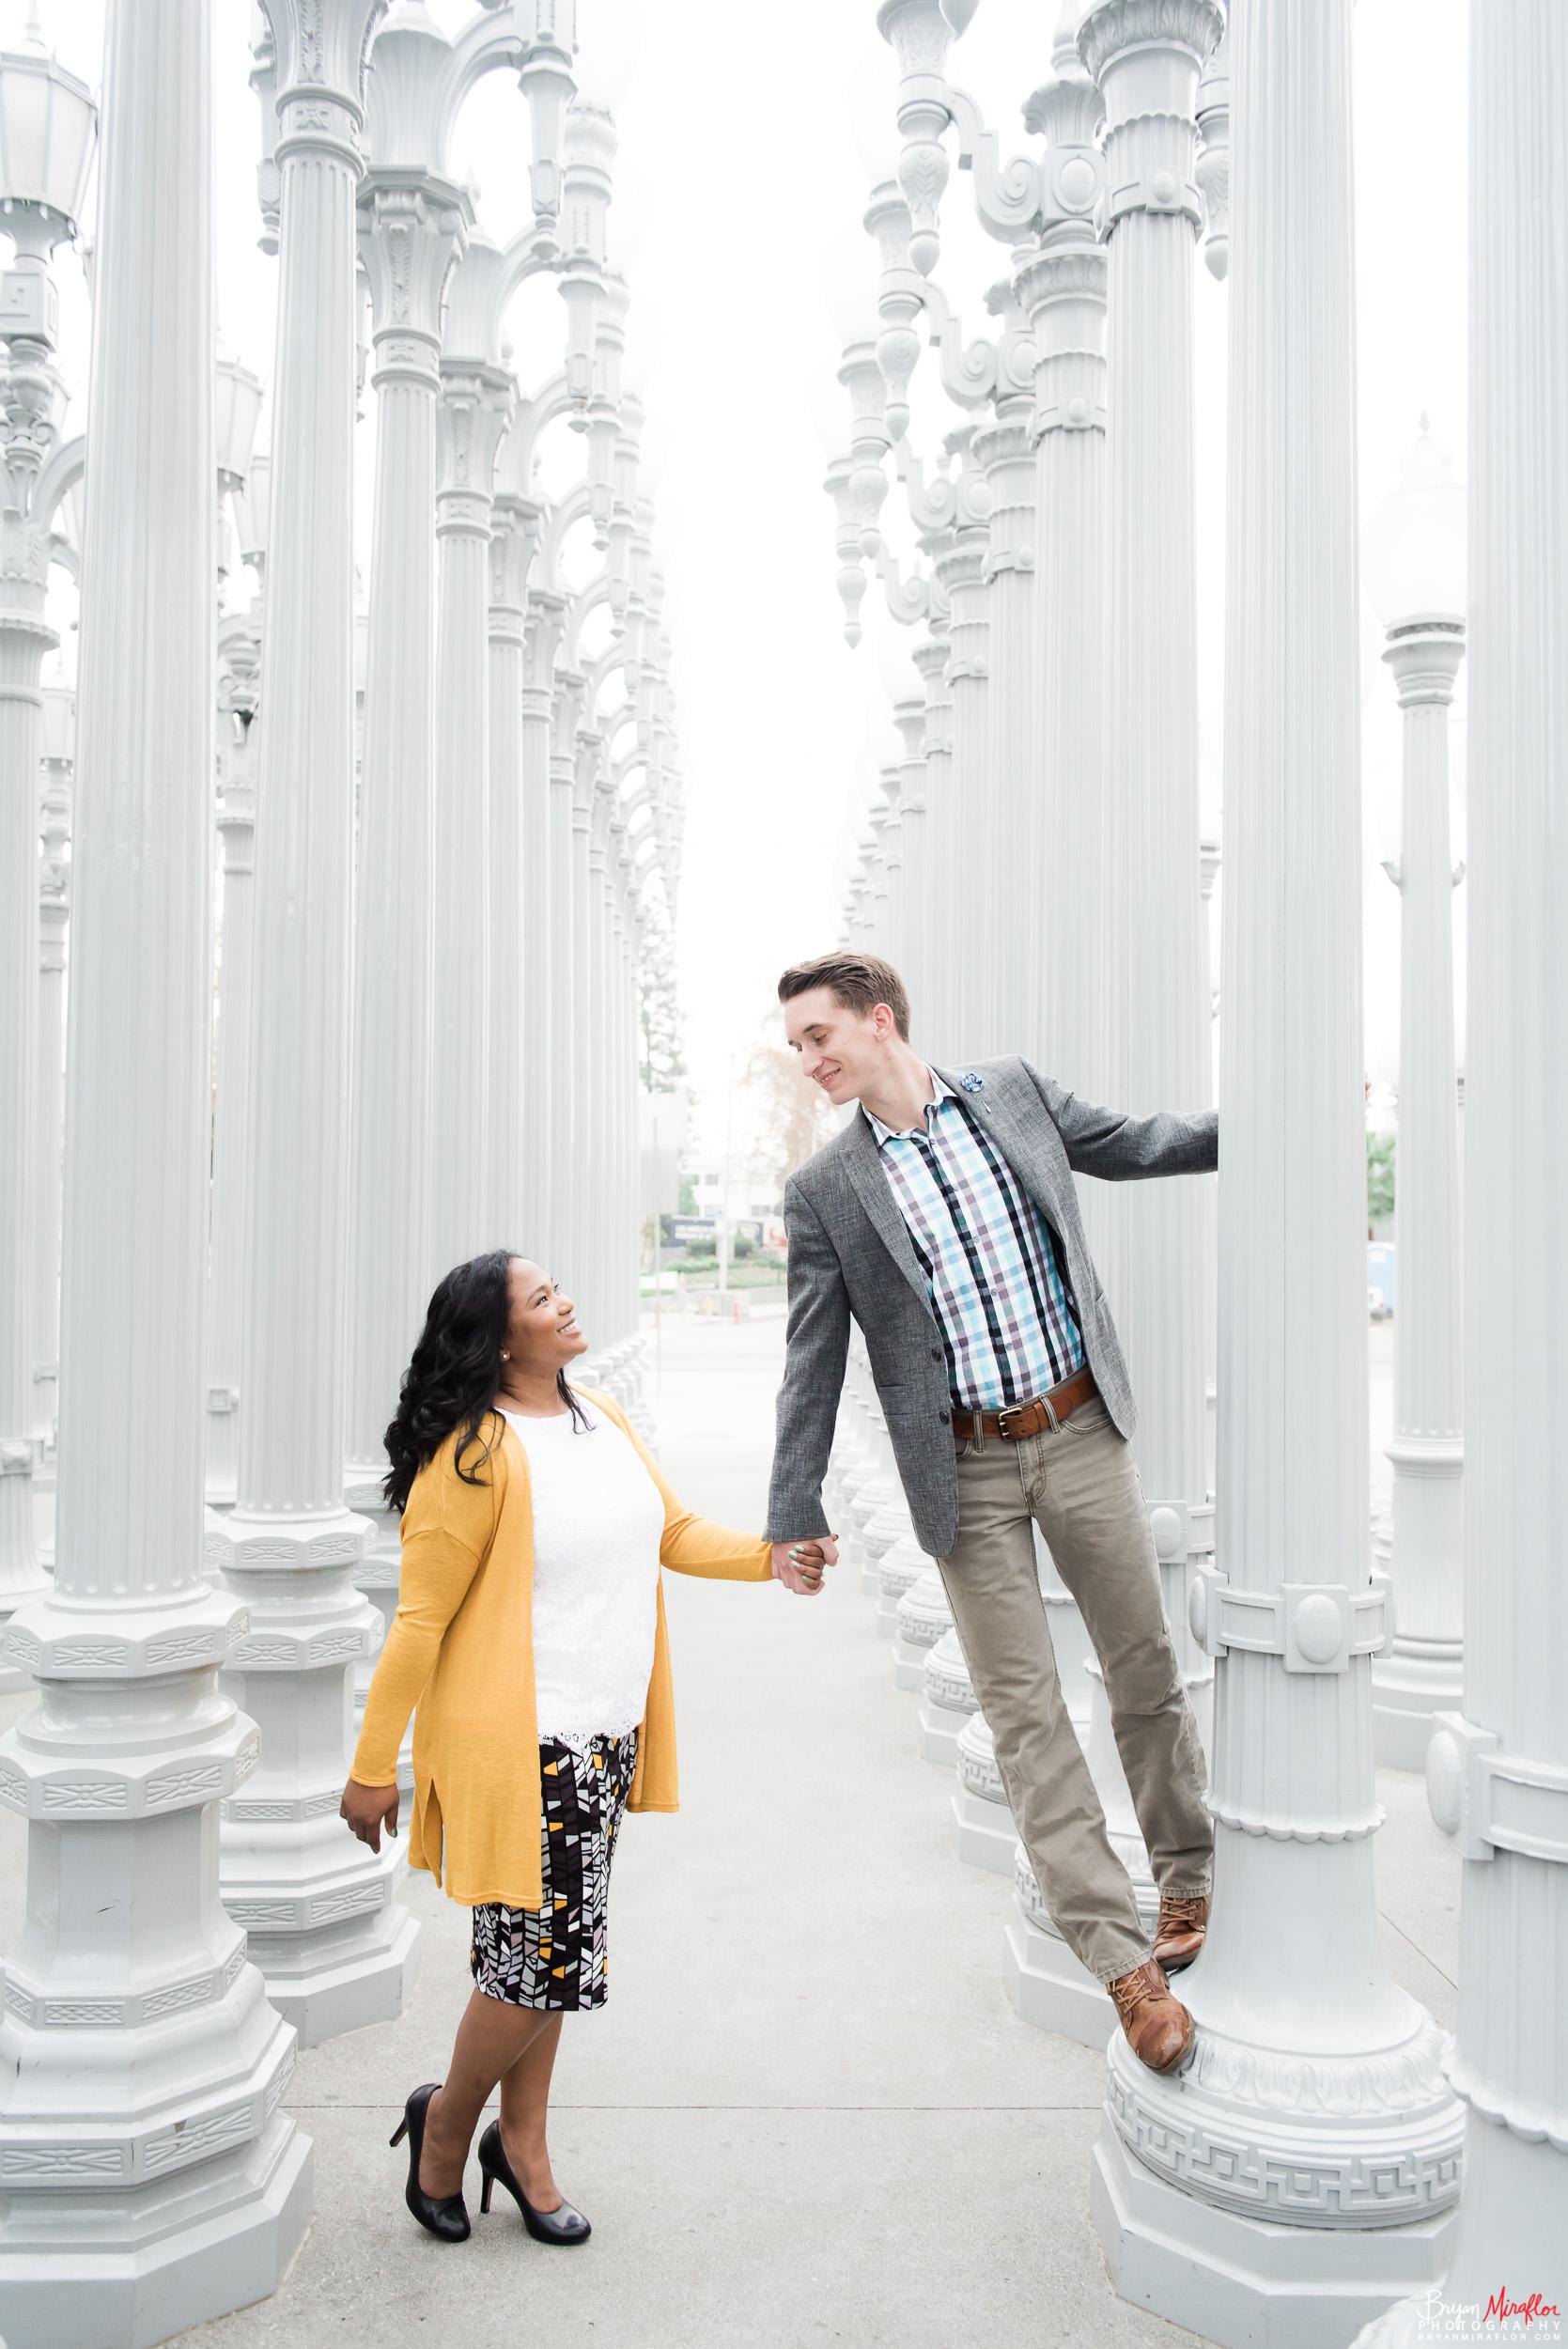 Bryan-Miraflor-Photography-Vanessa-Tommy-LACMA-DTLA-Engagement-Photoshoot-20161210-103.jpg